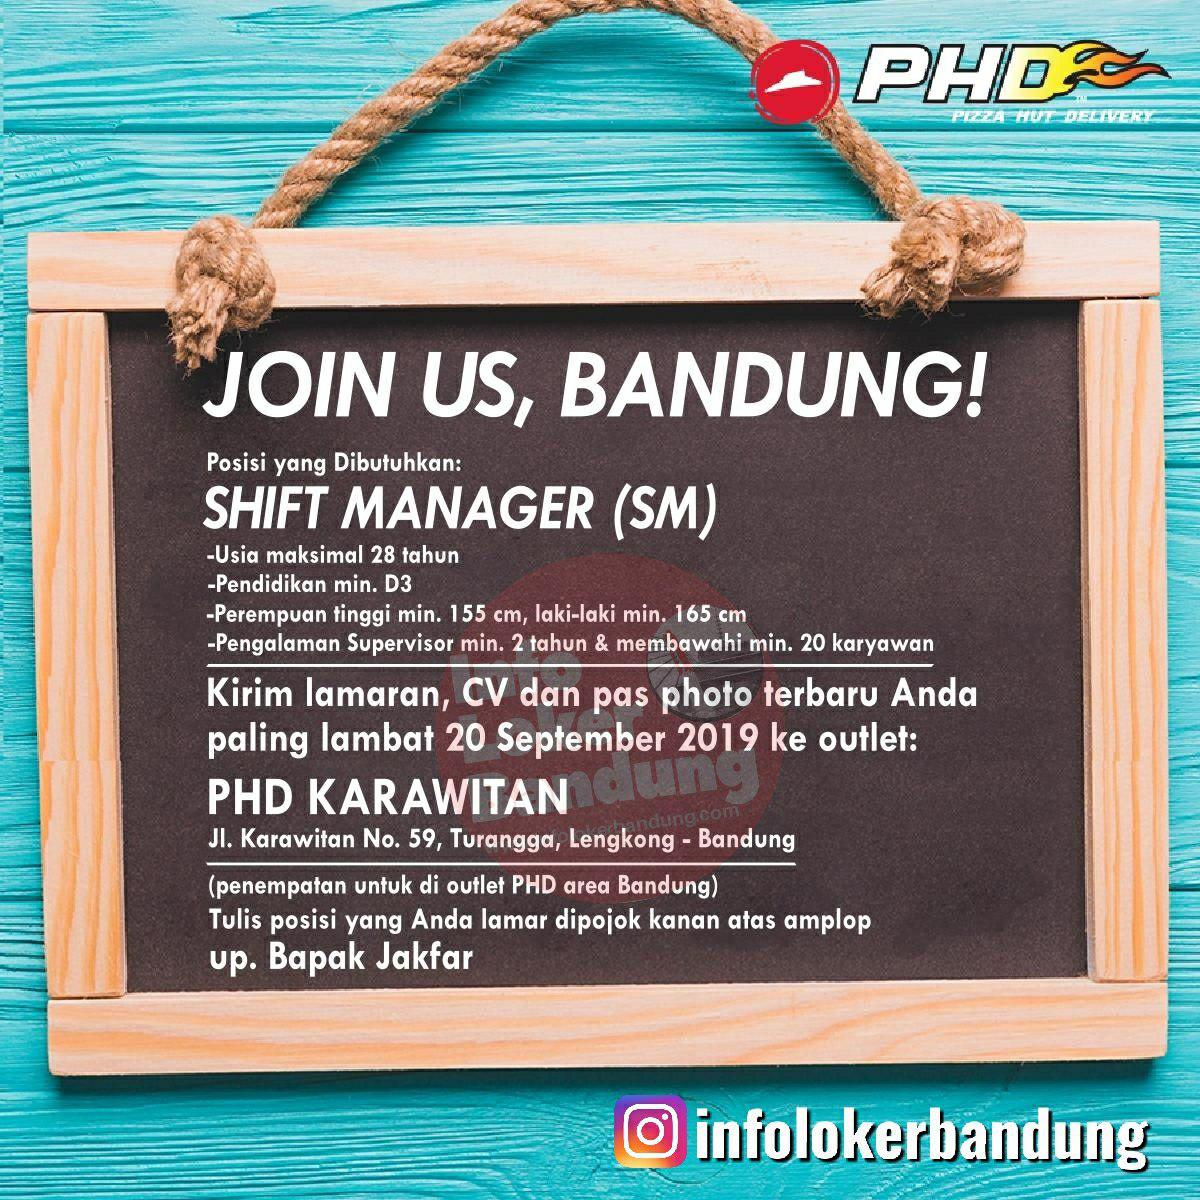 Lowongan Kerja Sebagai Shift Manager Pizza Hut Delivery (PHD) Karawitan Bandung September 2019